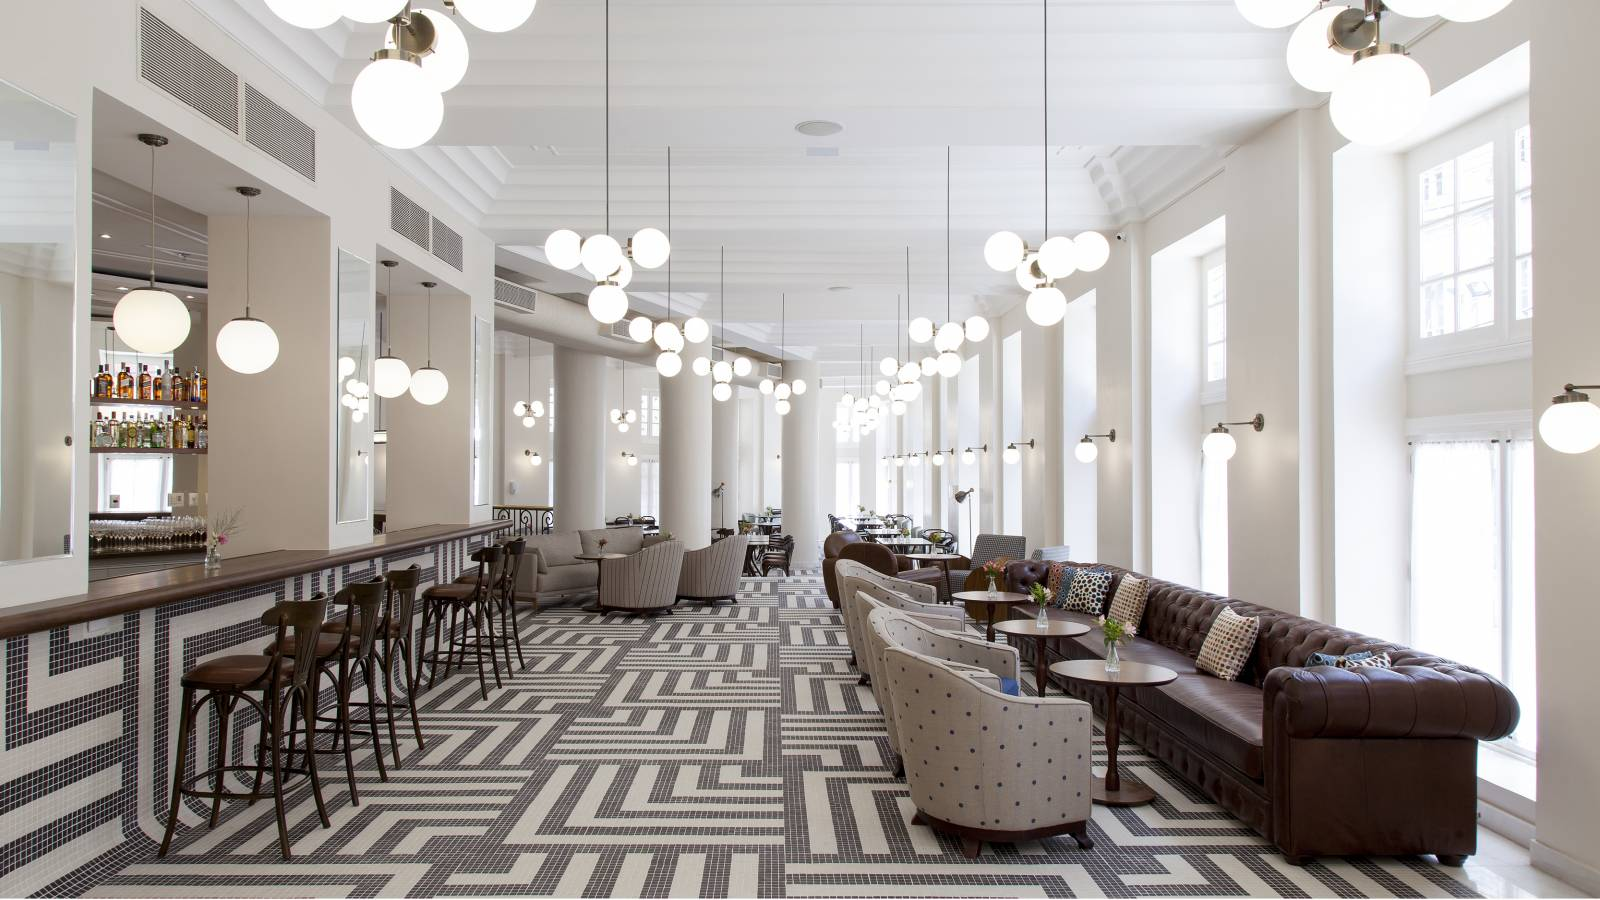 LOBBY BAR - Fera Palace Hotel - SPOL Architects